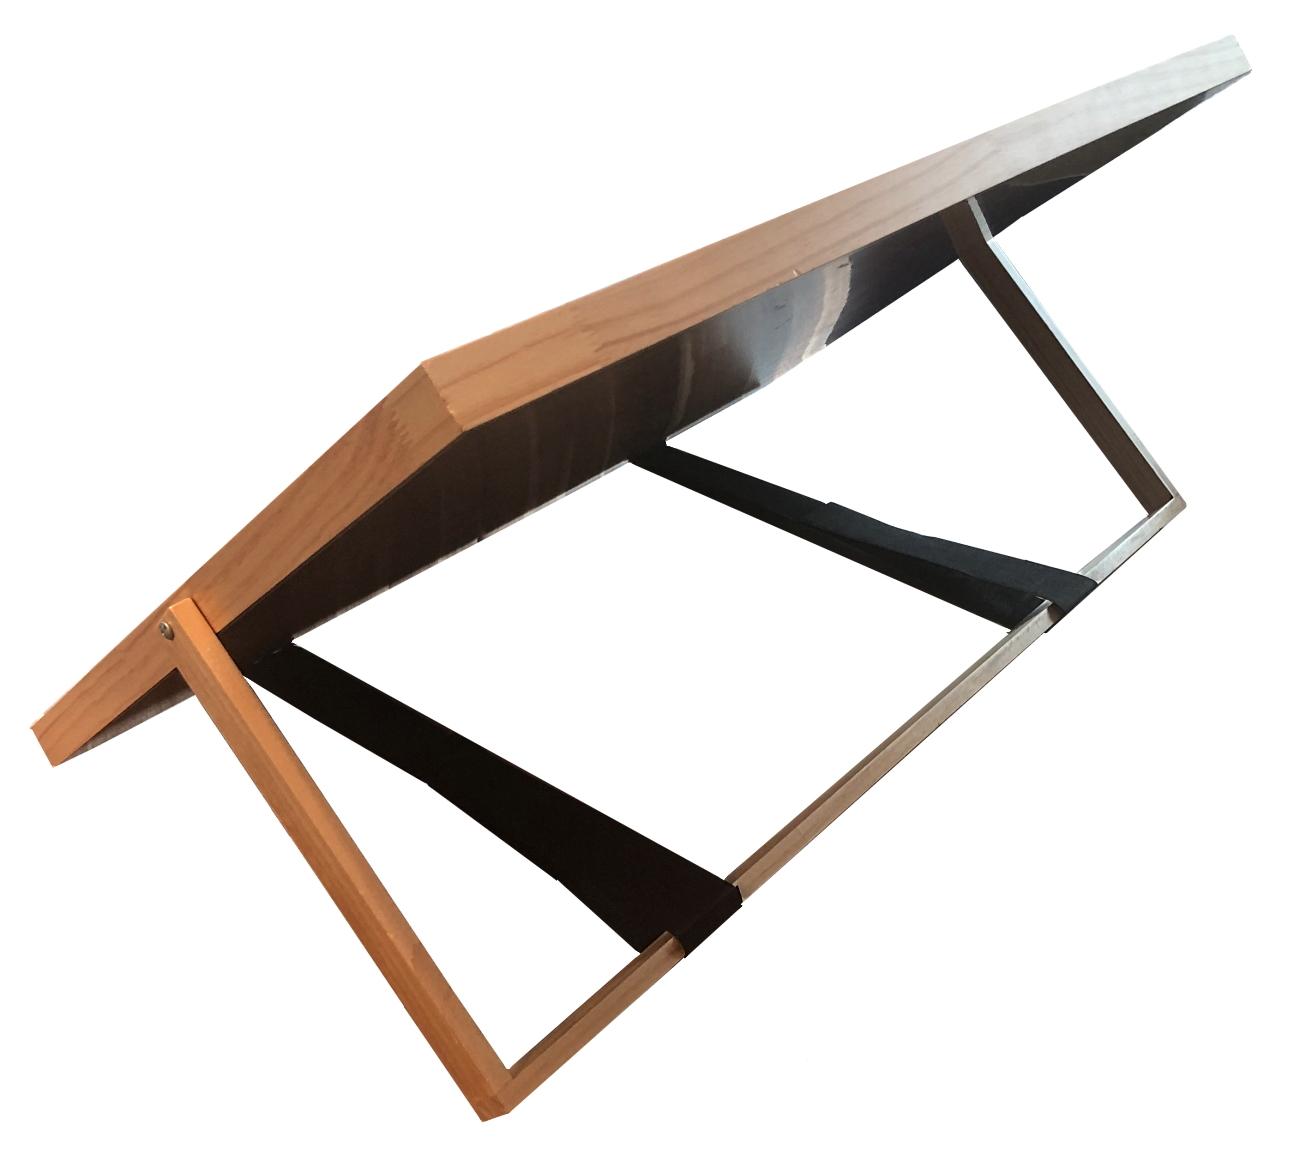 http://data.my-puzzle.fr/jig-and-puz.185/jig-puz-luxe-puzzle-table-100-a-1000-pieces-3-plateaux-de-tri.83070-4.fs.jpg